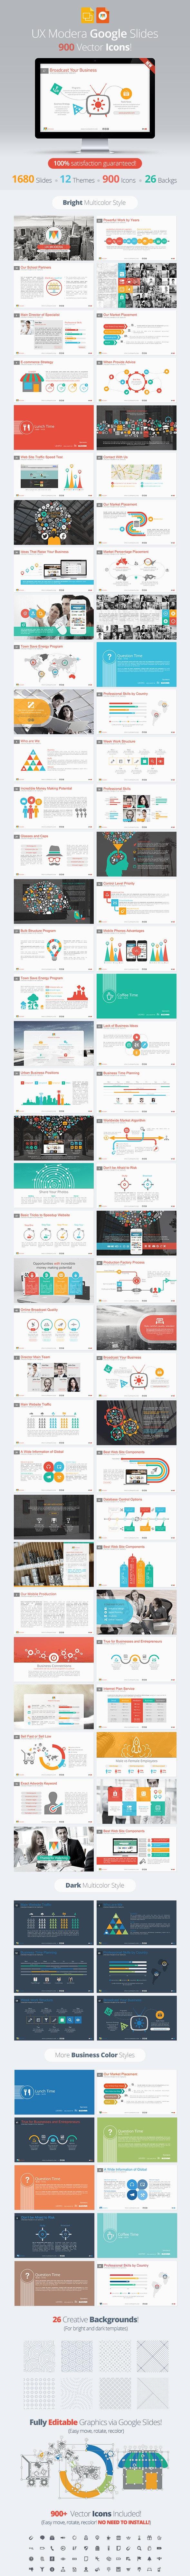 Modera Google Slides Presentation Template - Google Slides Presentation Templates